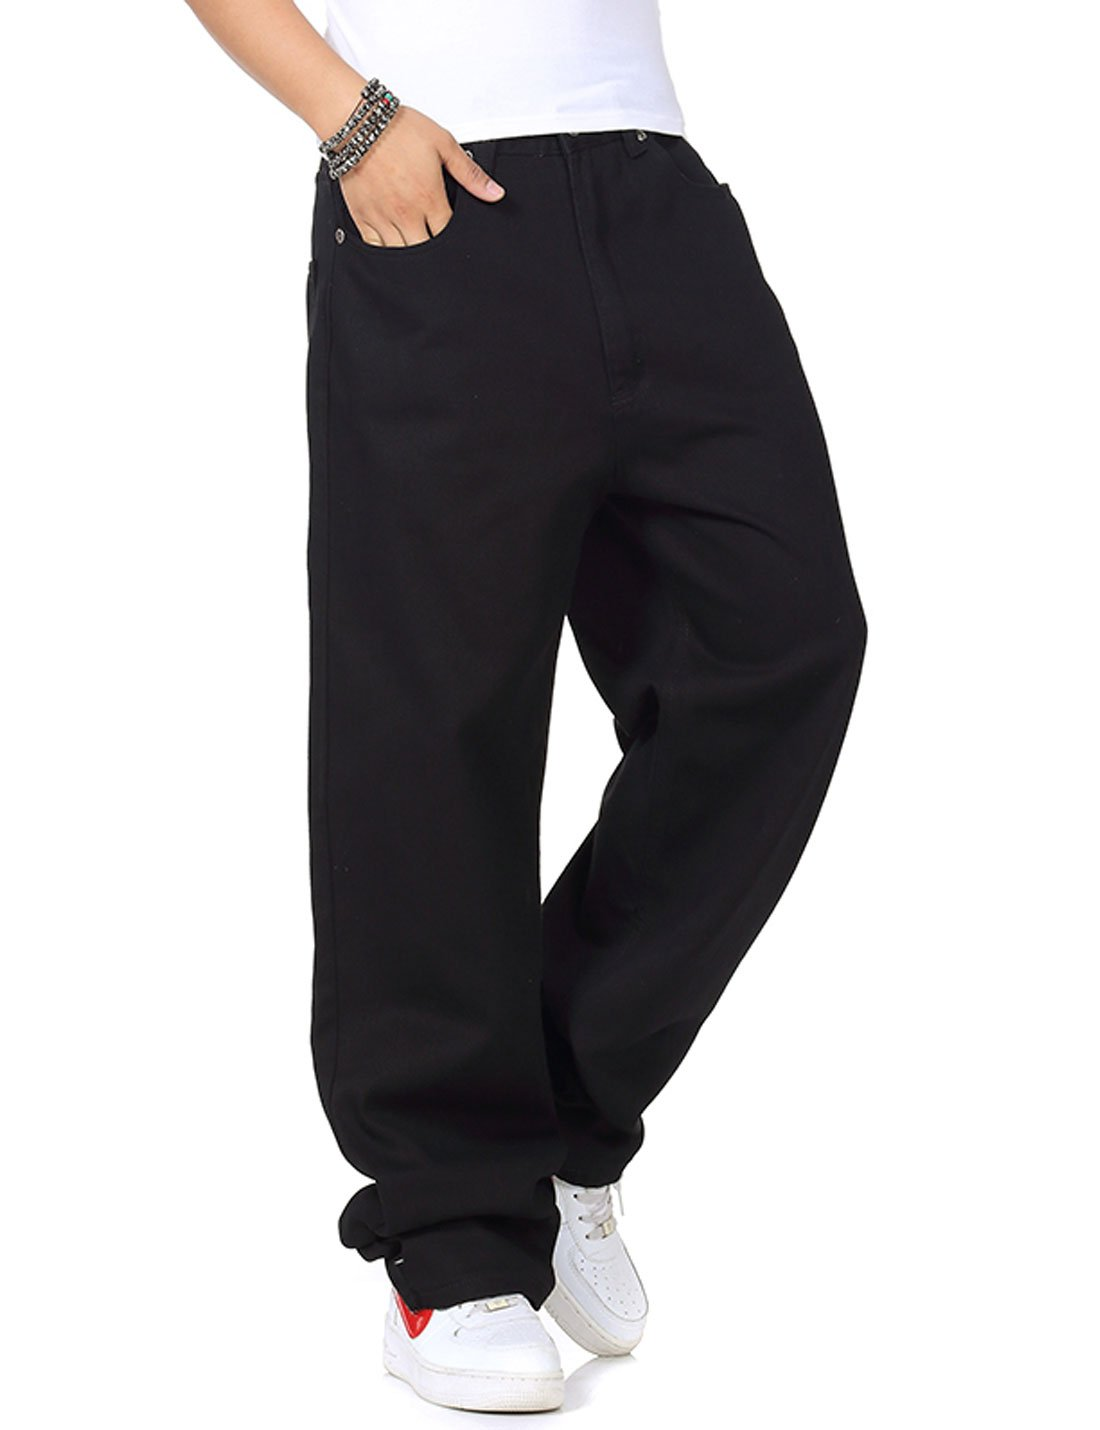 Yeokou Men's Loose Baggy Hip Hop Cotton Denim Work Pants Straight Leg Jeans?Black 40?